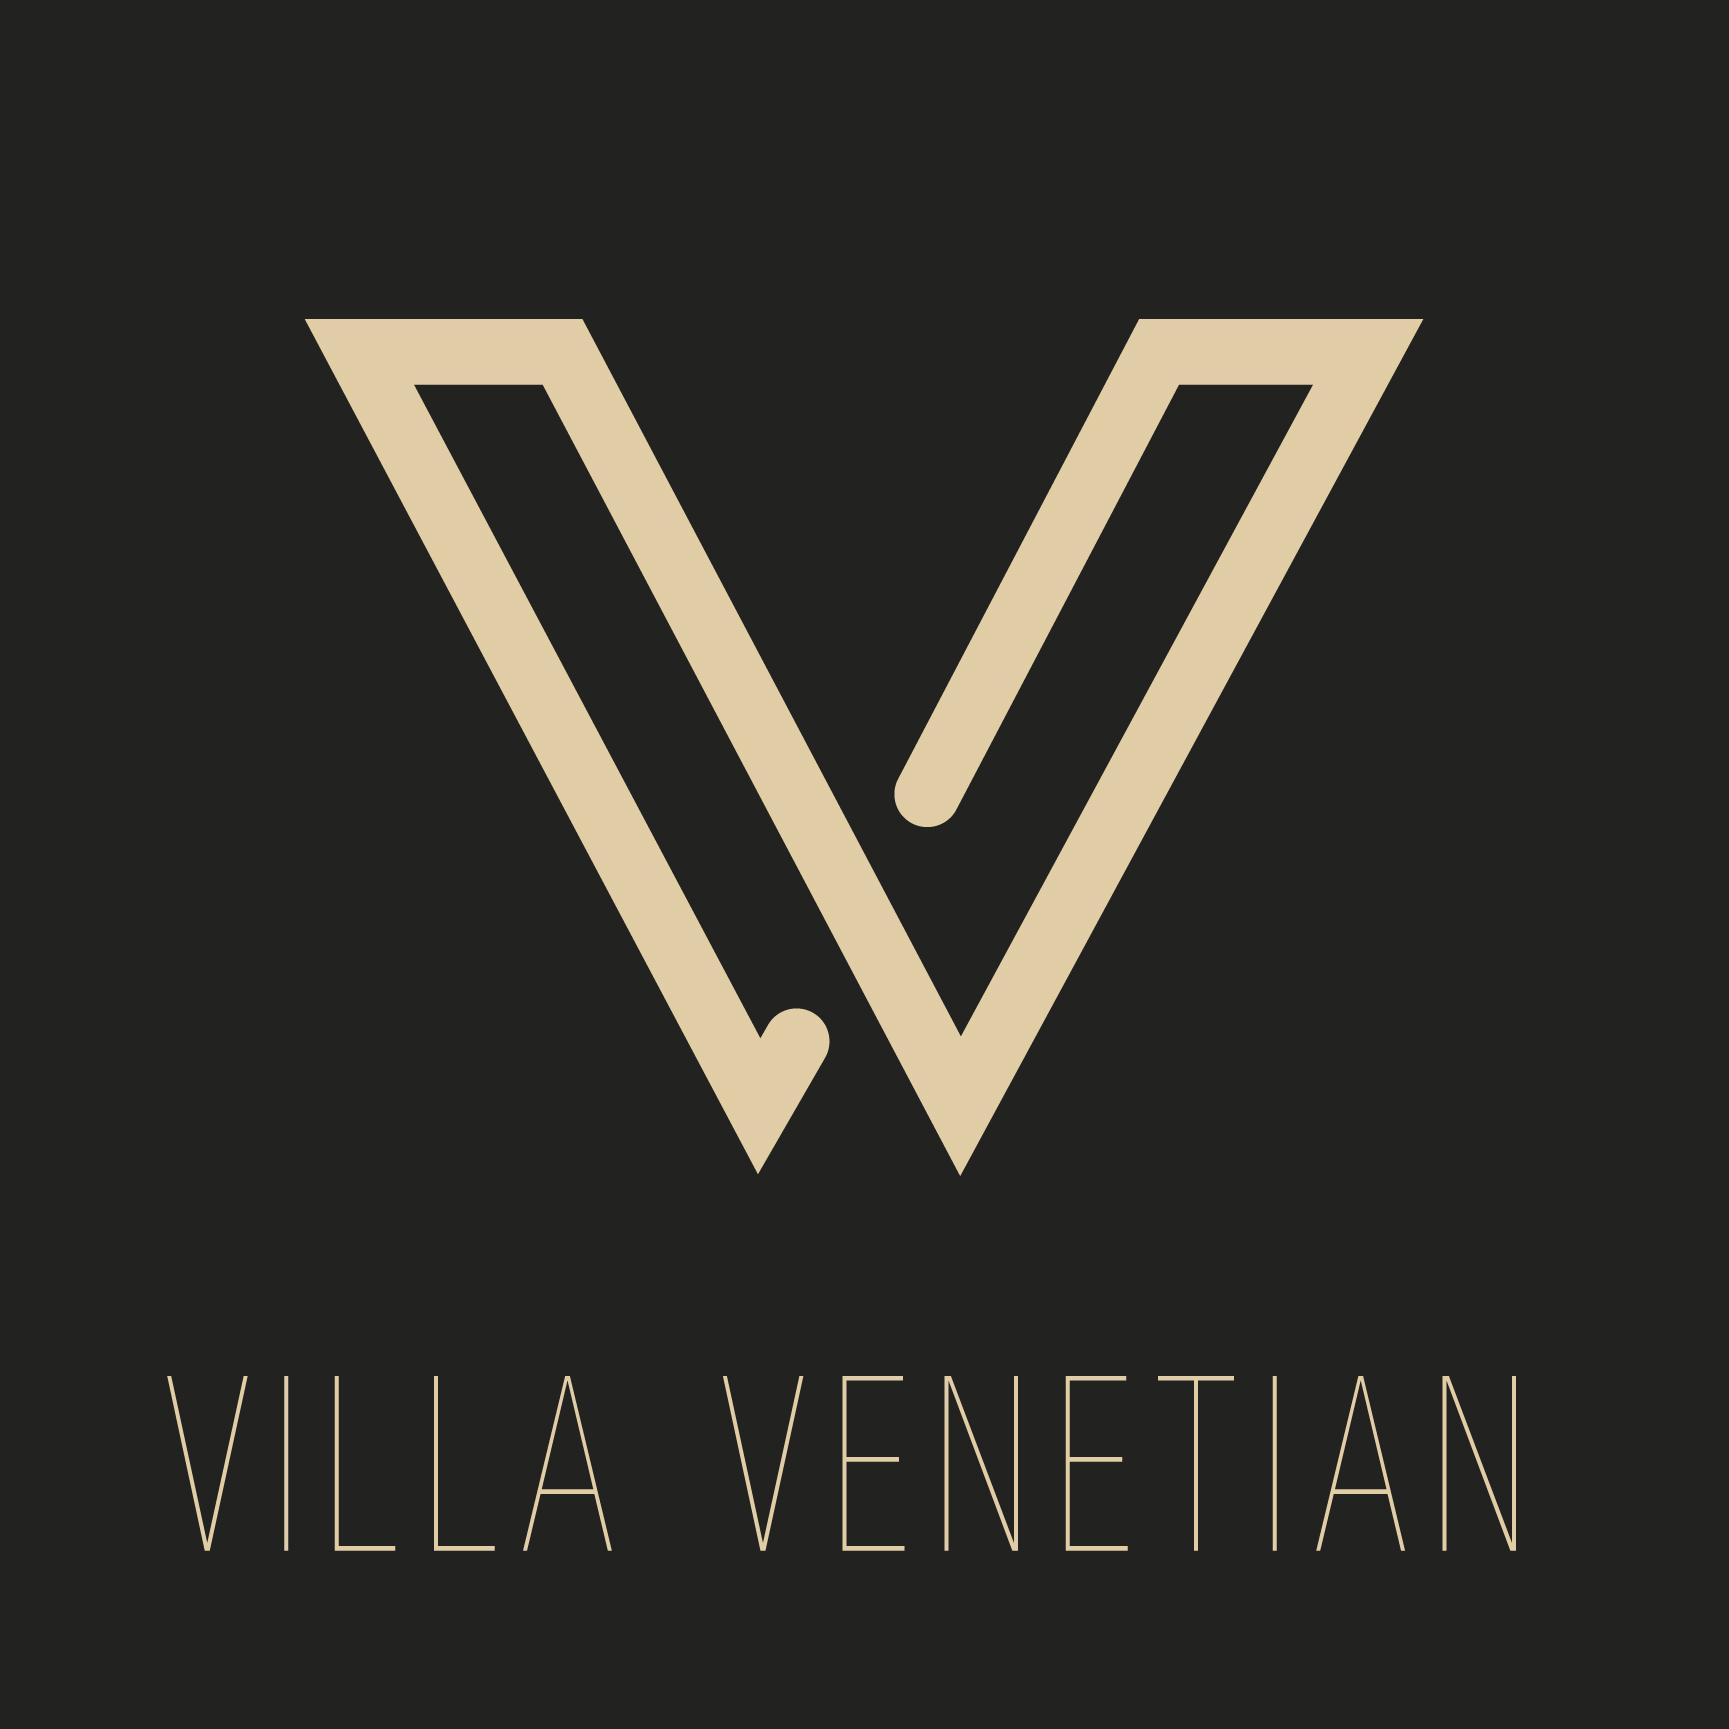 Villa Venetian